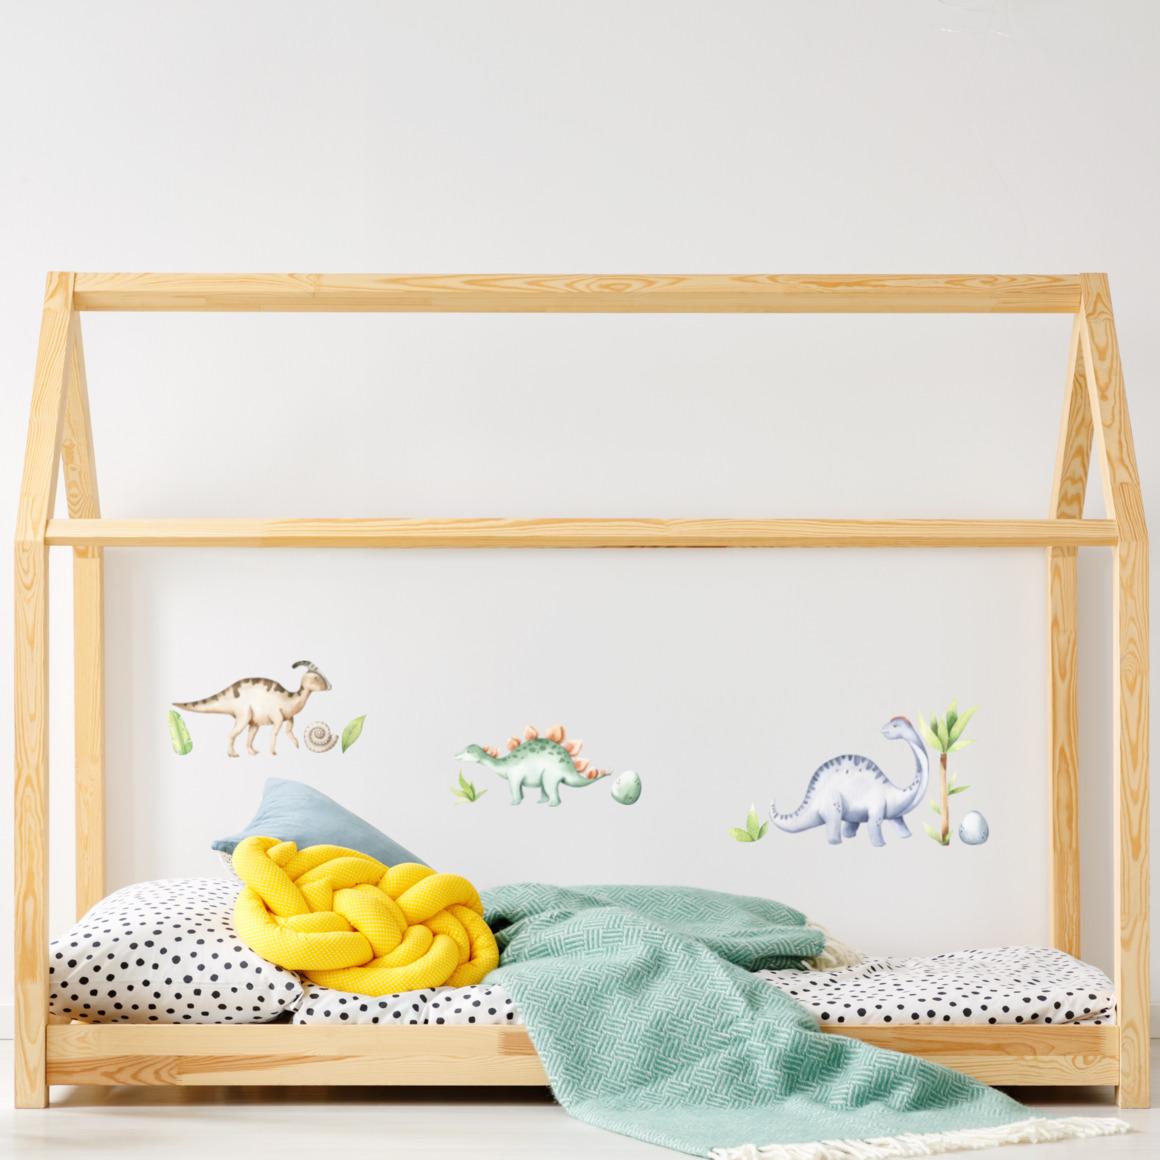 Fabric wall decals - Dinosaurs1   Trada Marketplace